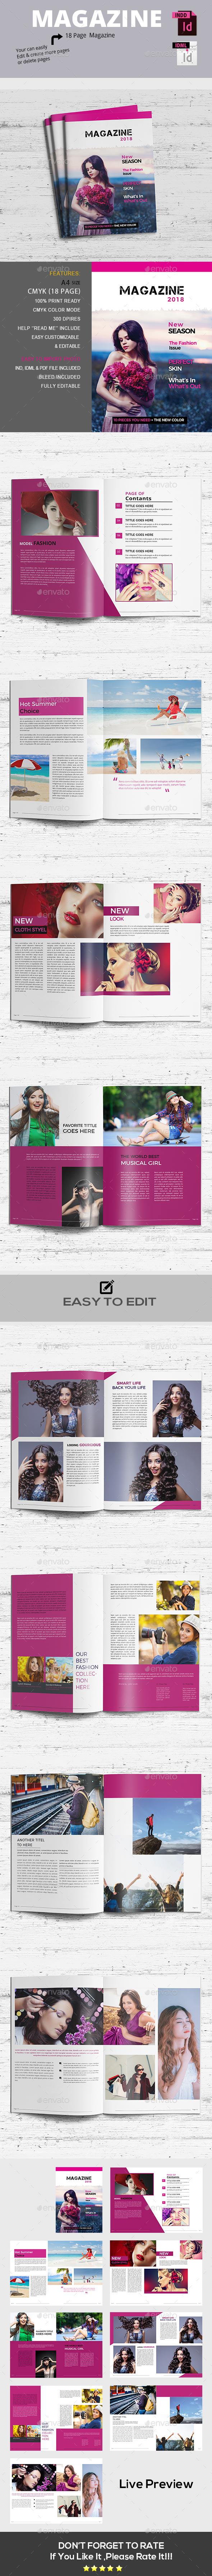 The Magazine - Magazines Print Templates